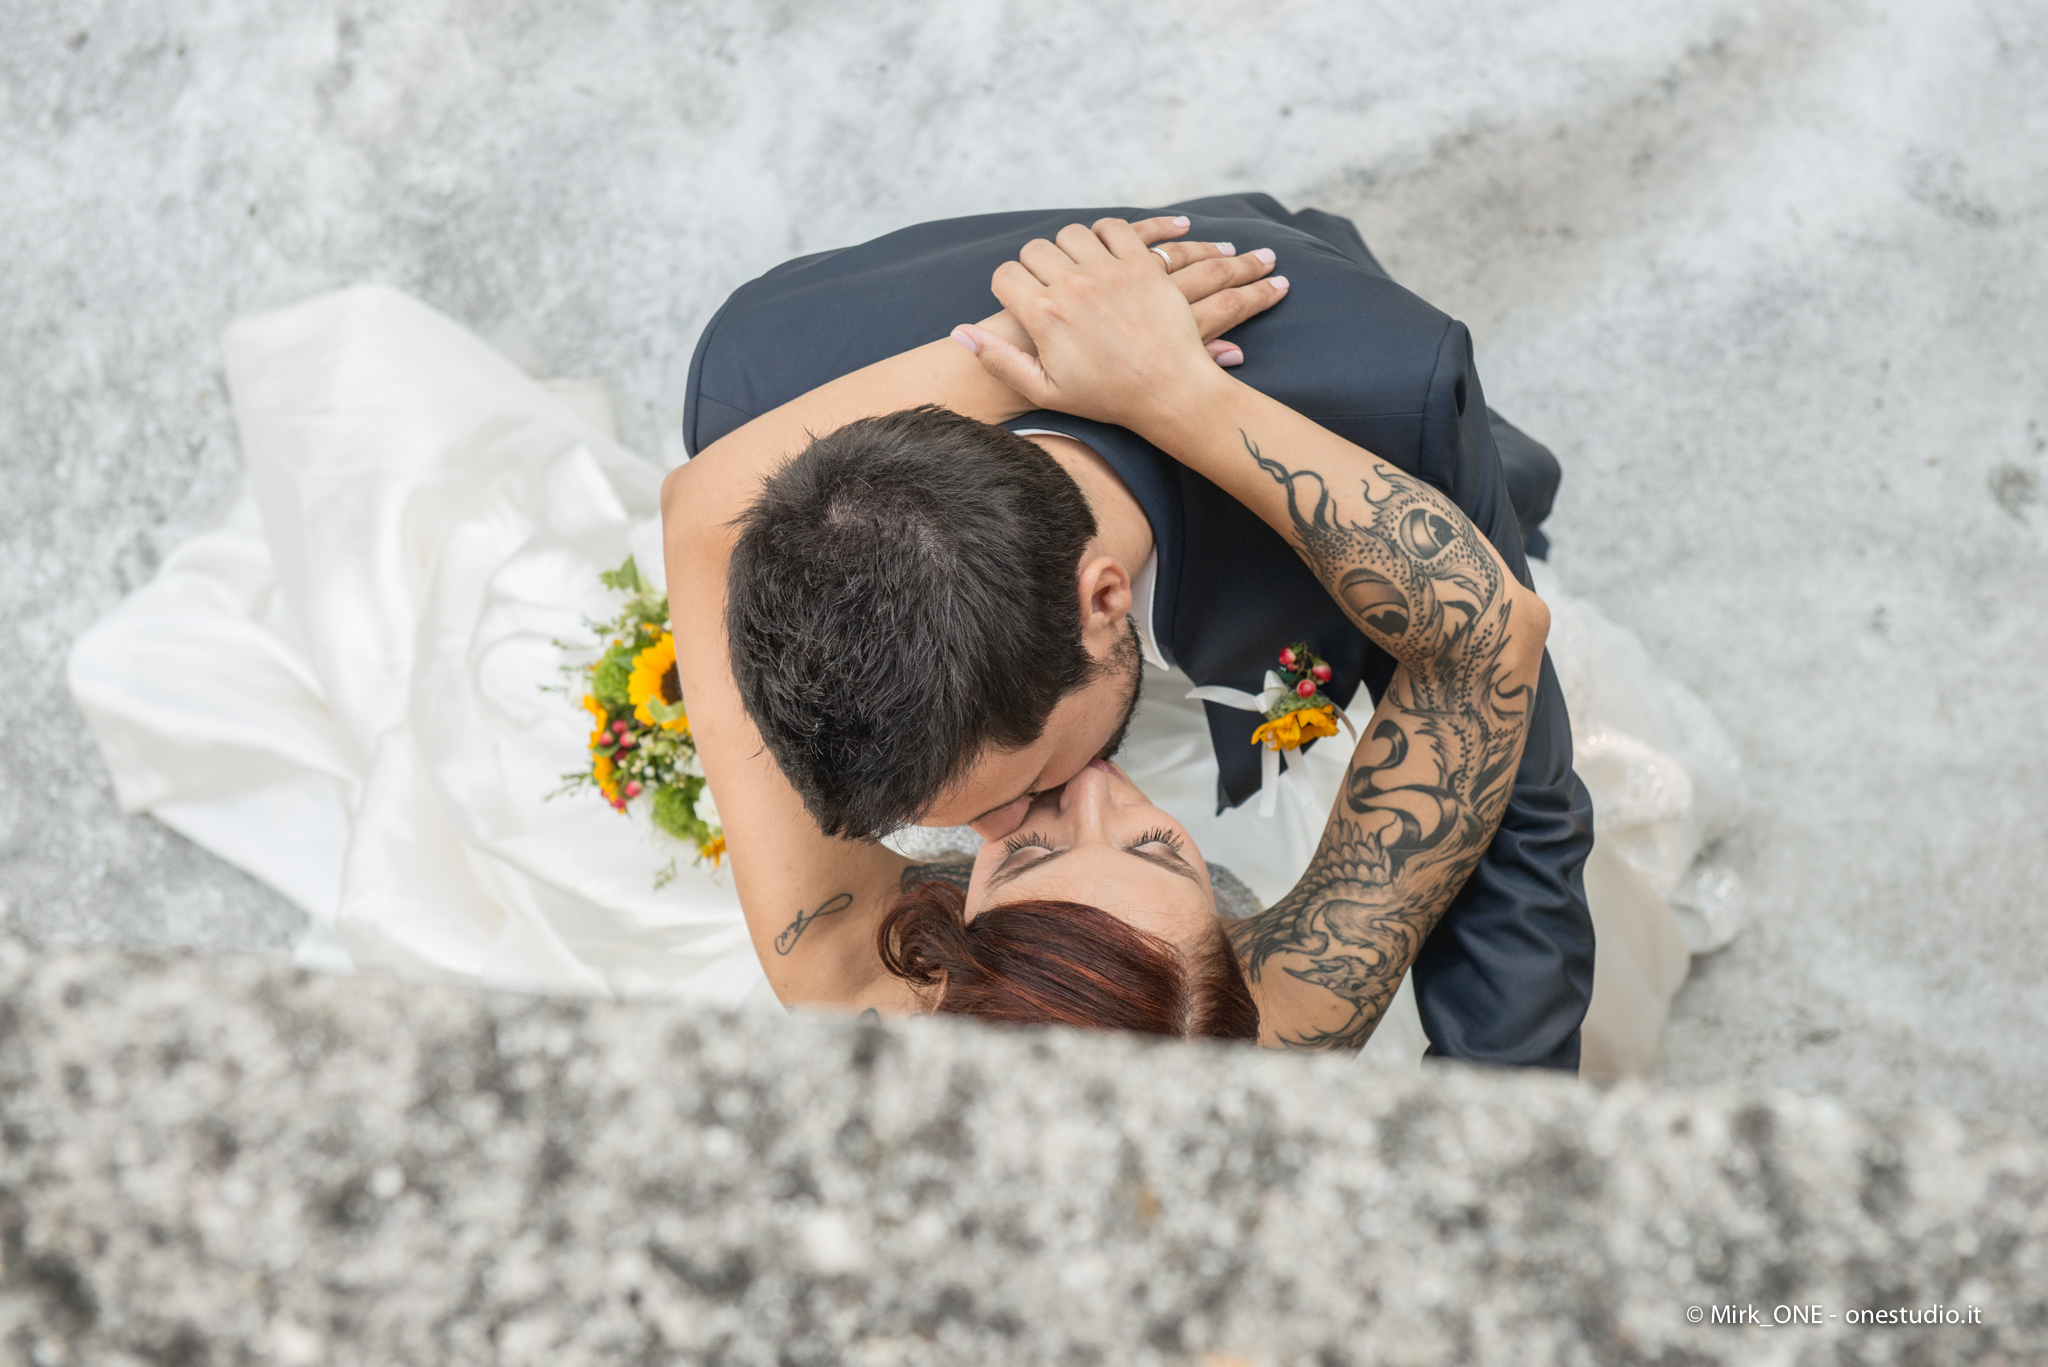 https://lnx.mirkone.it/wp-content/uploads/2015/07/mirk_ONE-fotografo-matrimonio-00816.jpg